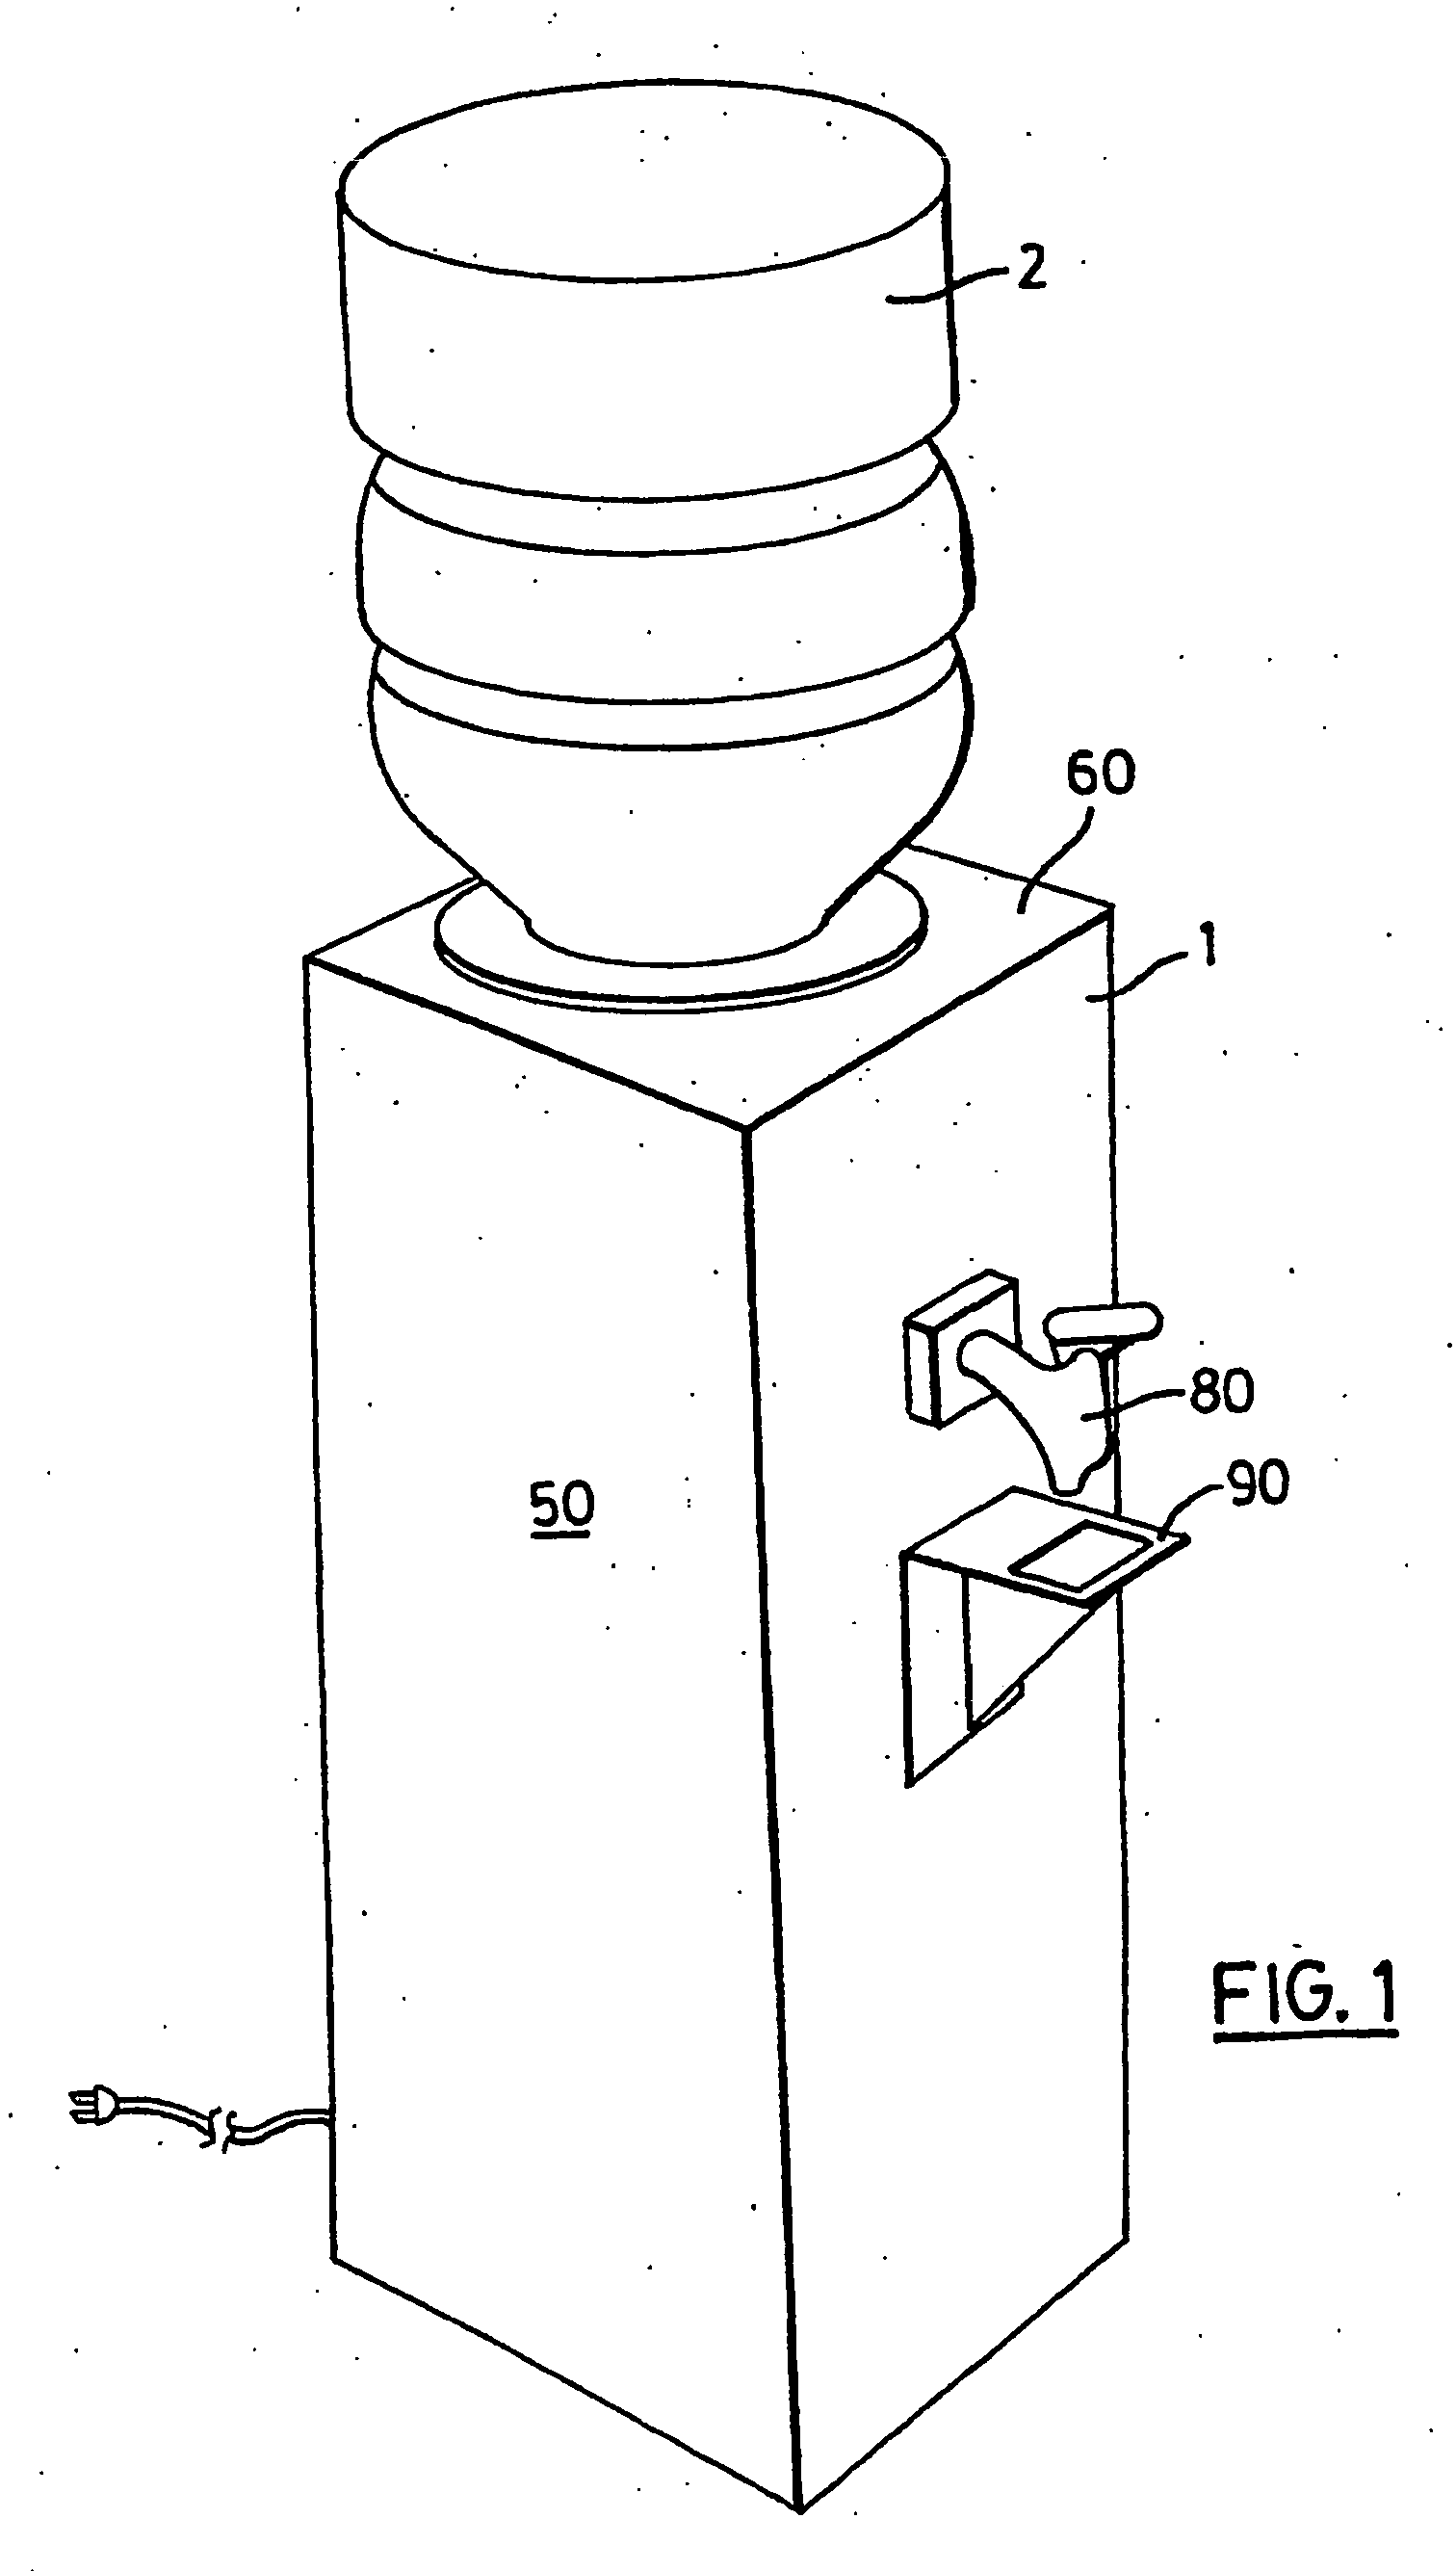 Patent Ep1603825b1